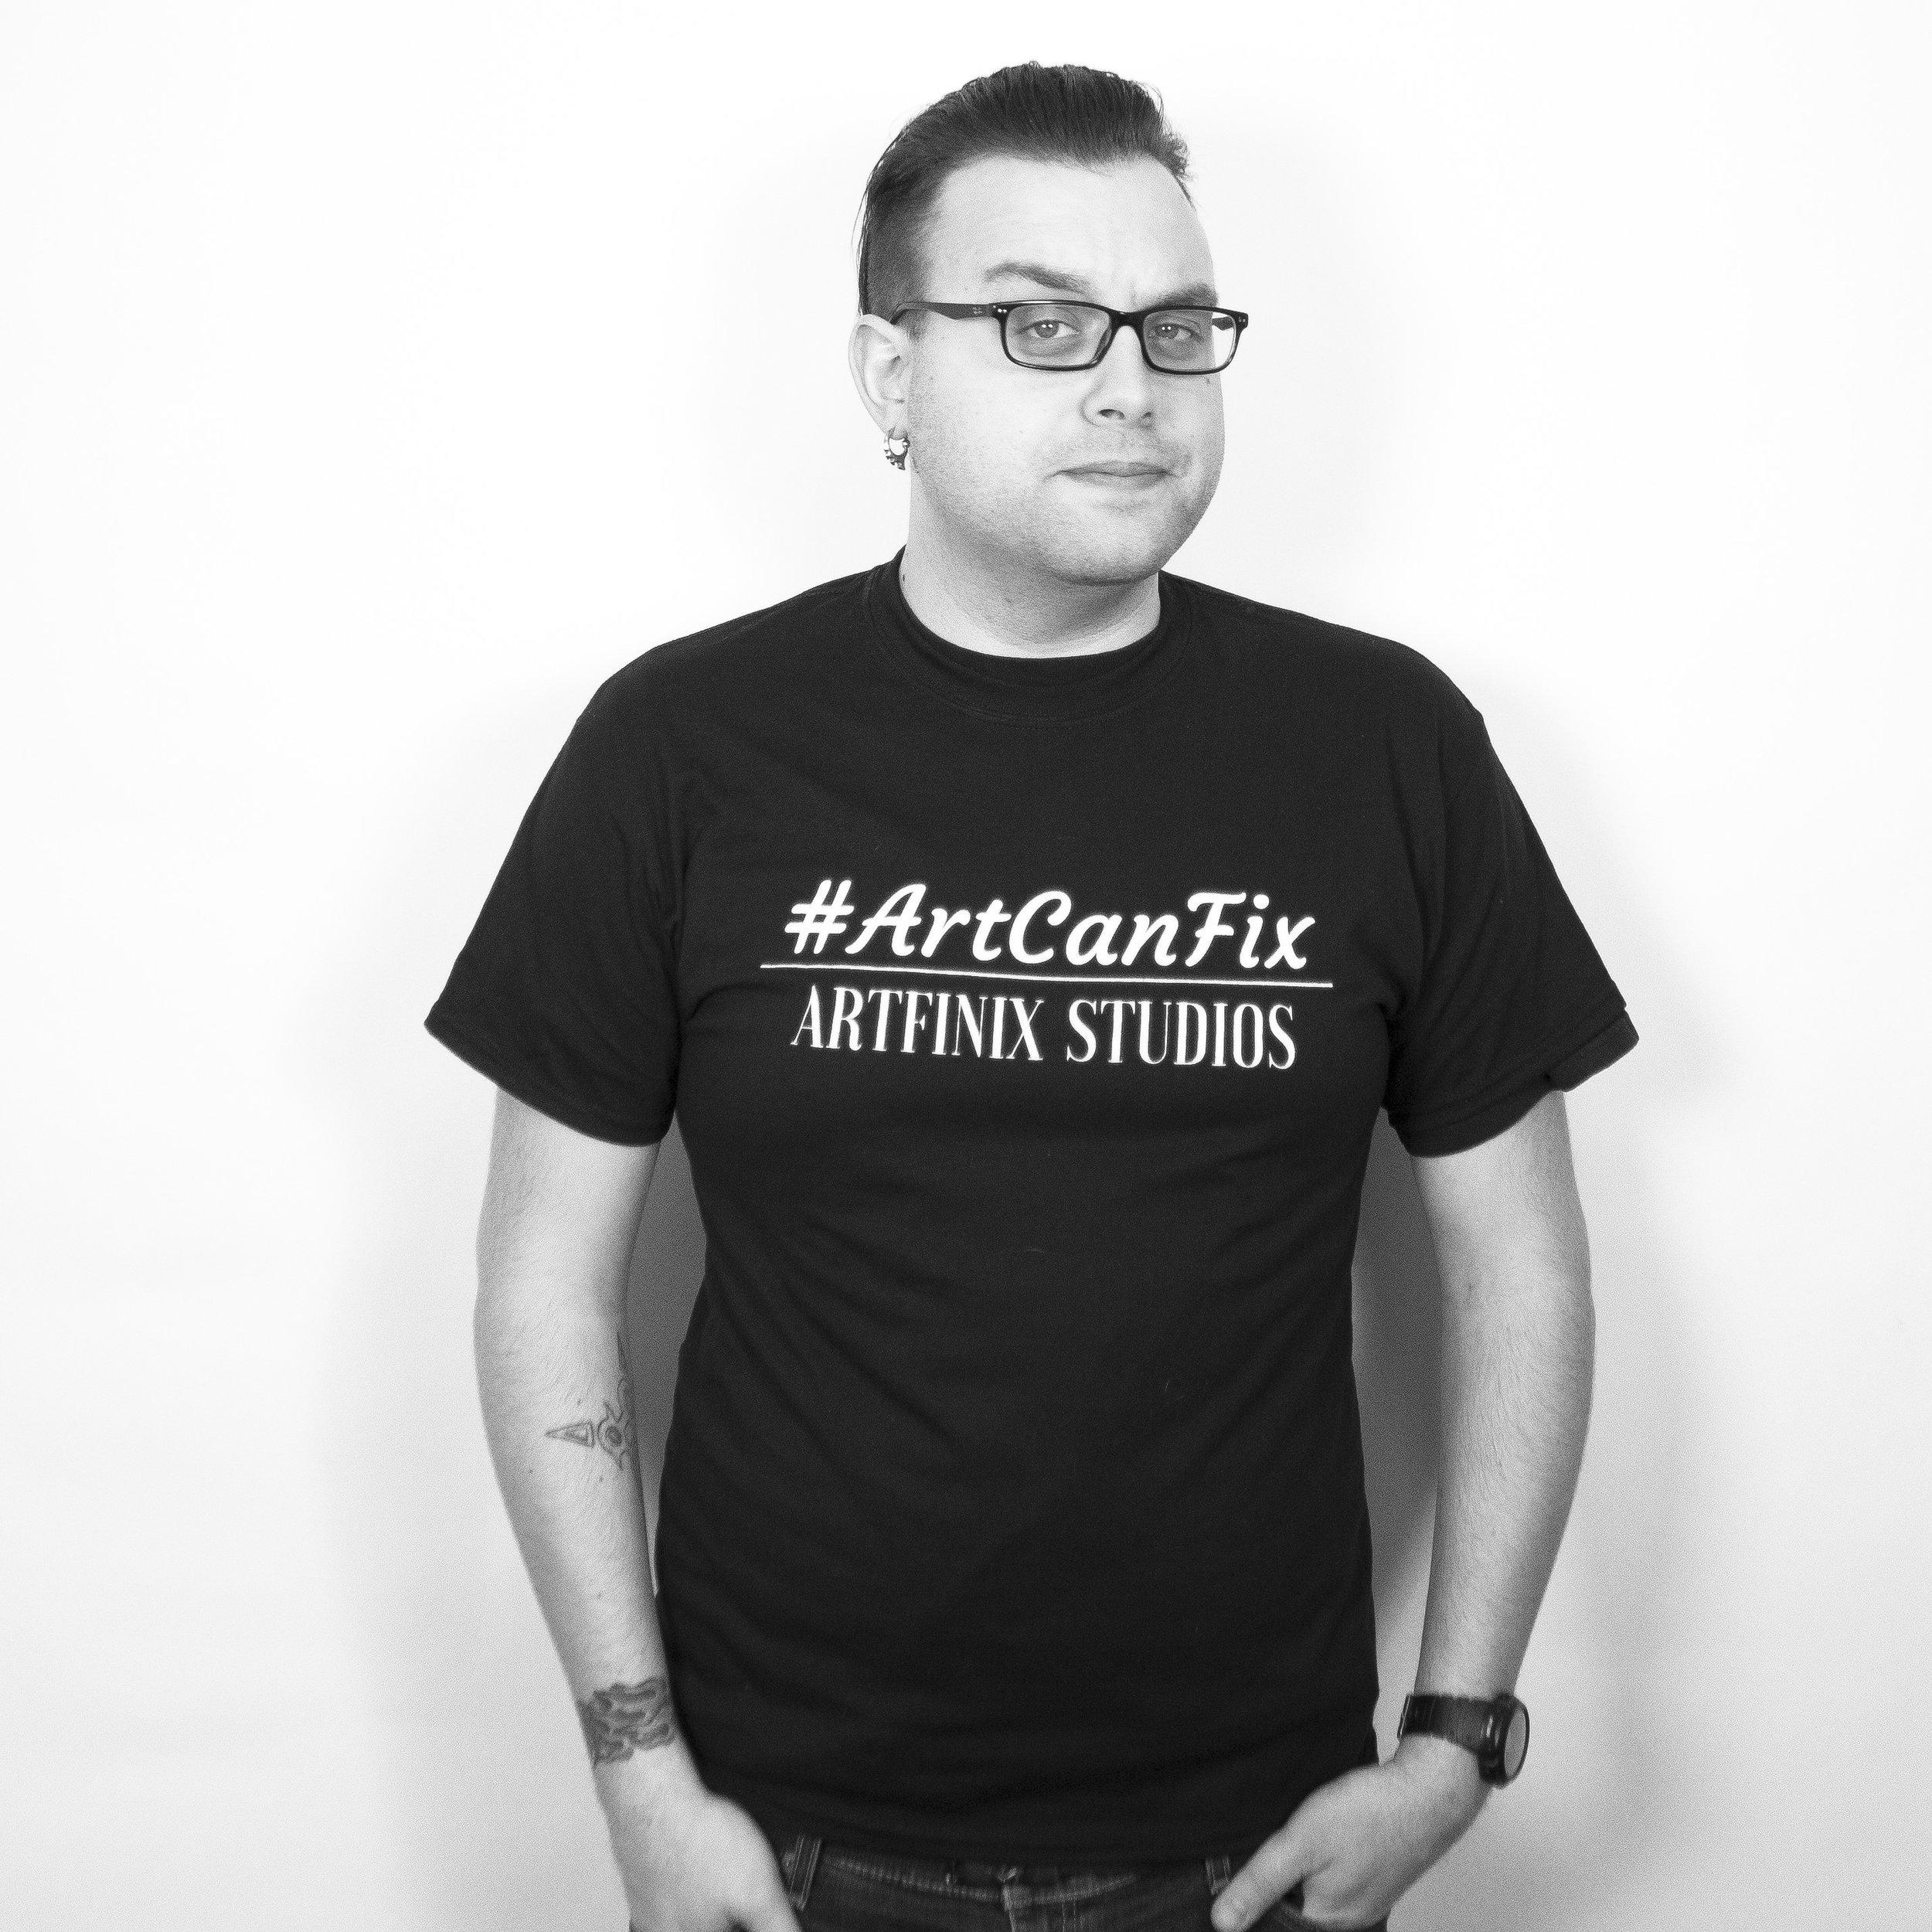 Artfinix Studios - ArtCanFix Pikz - Nick (black and white).JPG